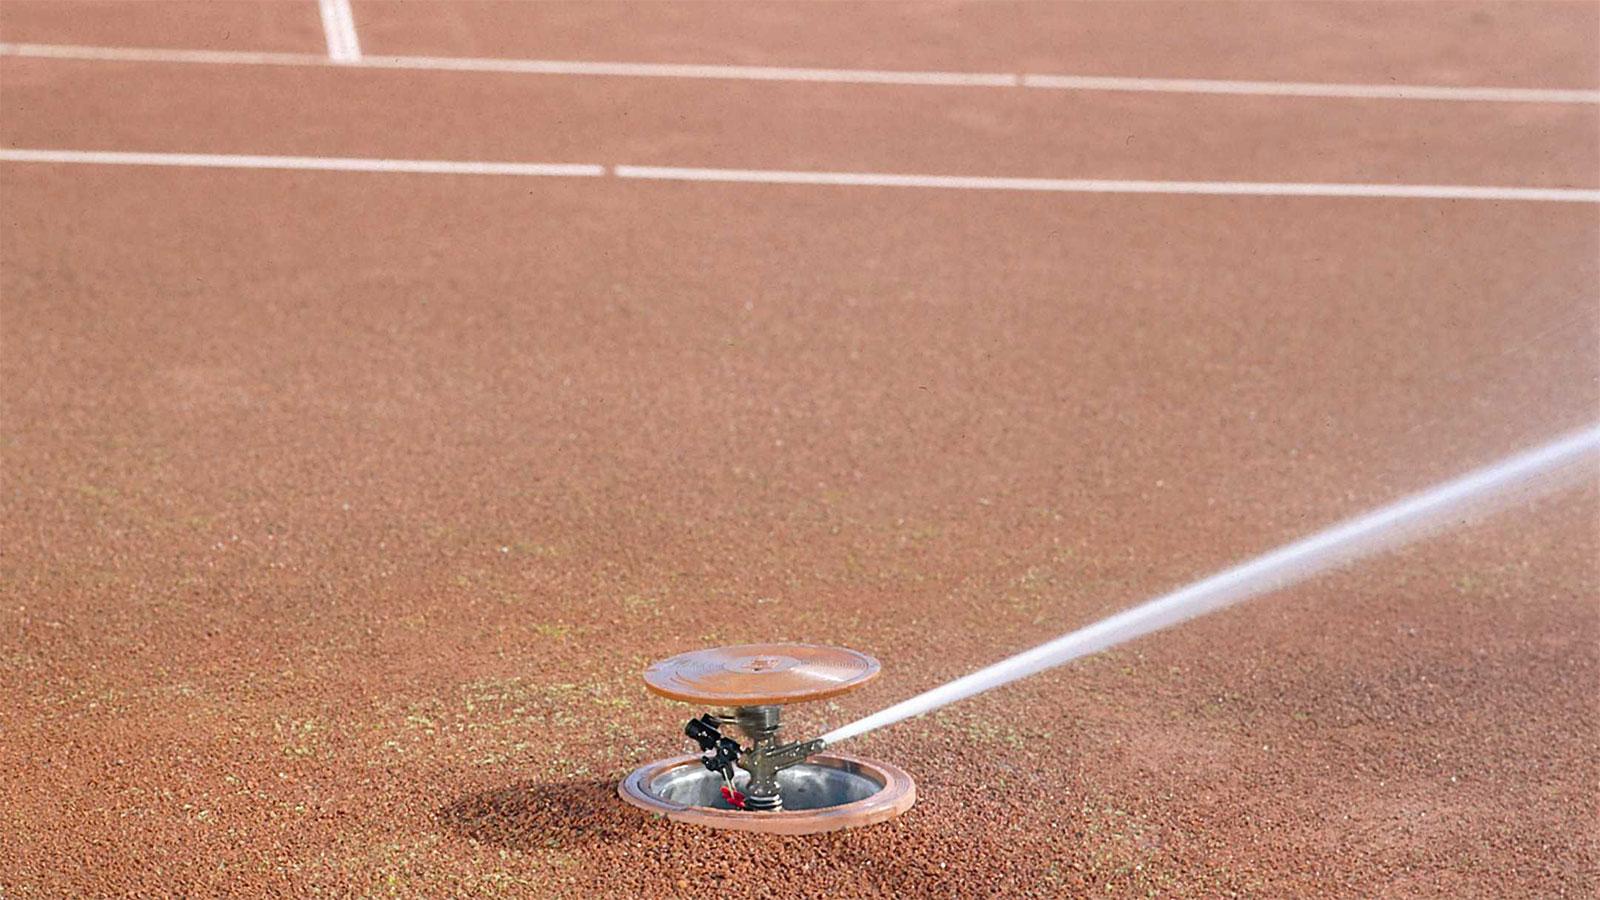 Bewässerung Tennisplatz